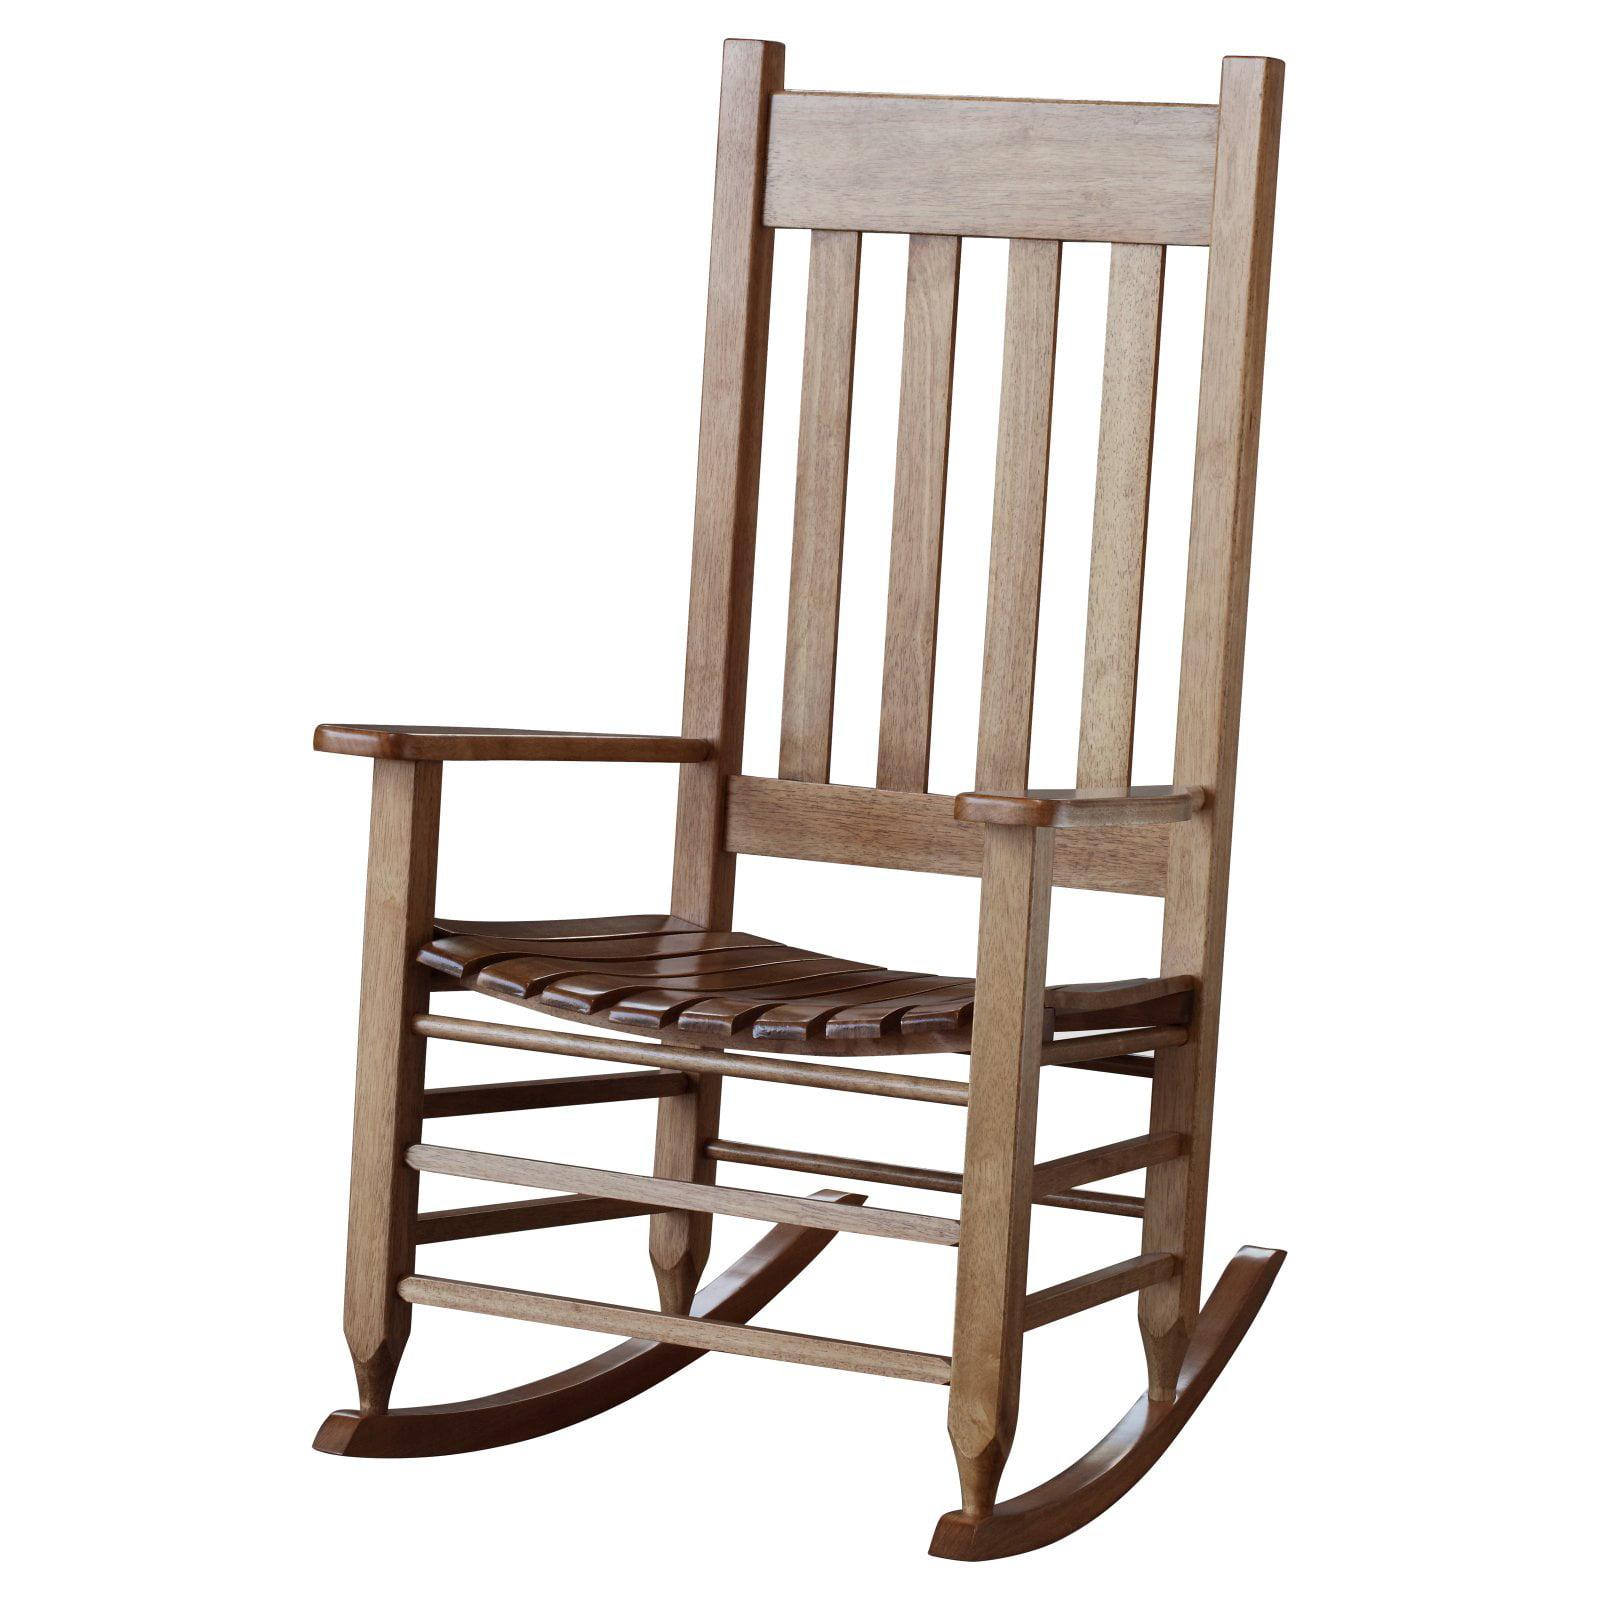 sc 1 st  Walmart & Hinkle Chair Company Plantation Outdoor Rocking Chair - Walmart.com